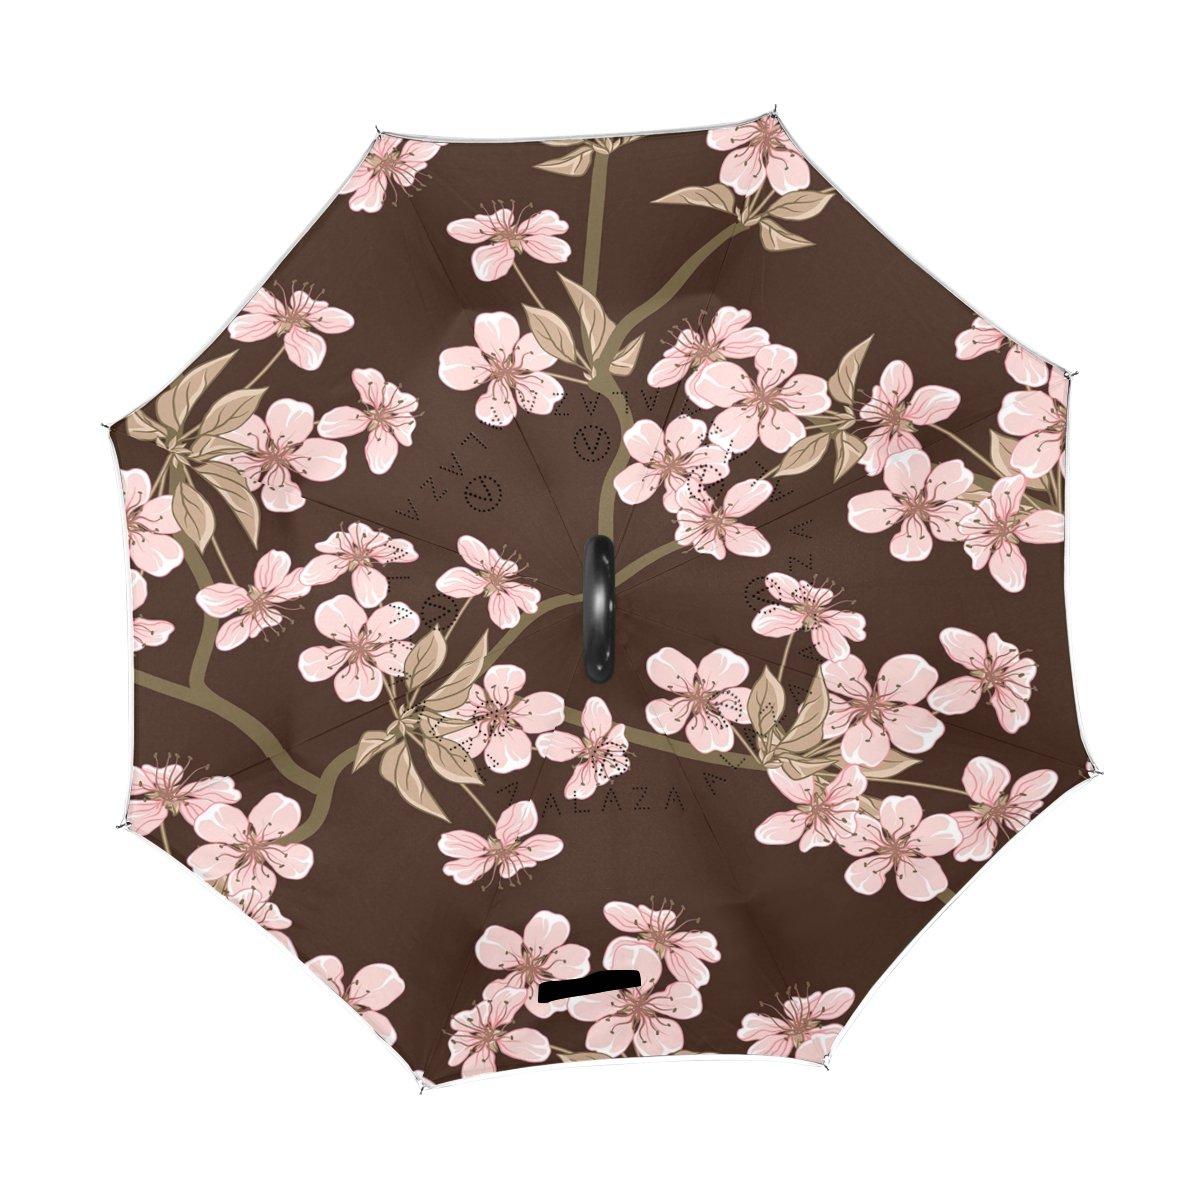 Wamika - Paraguas inverso para coche, doble capa, protección UV, paraguas invertido, vector de cerezo con paraguas negro de apertura automática, ...